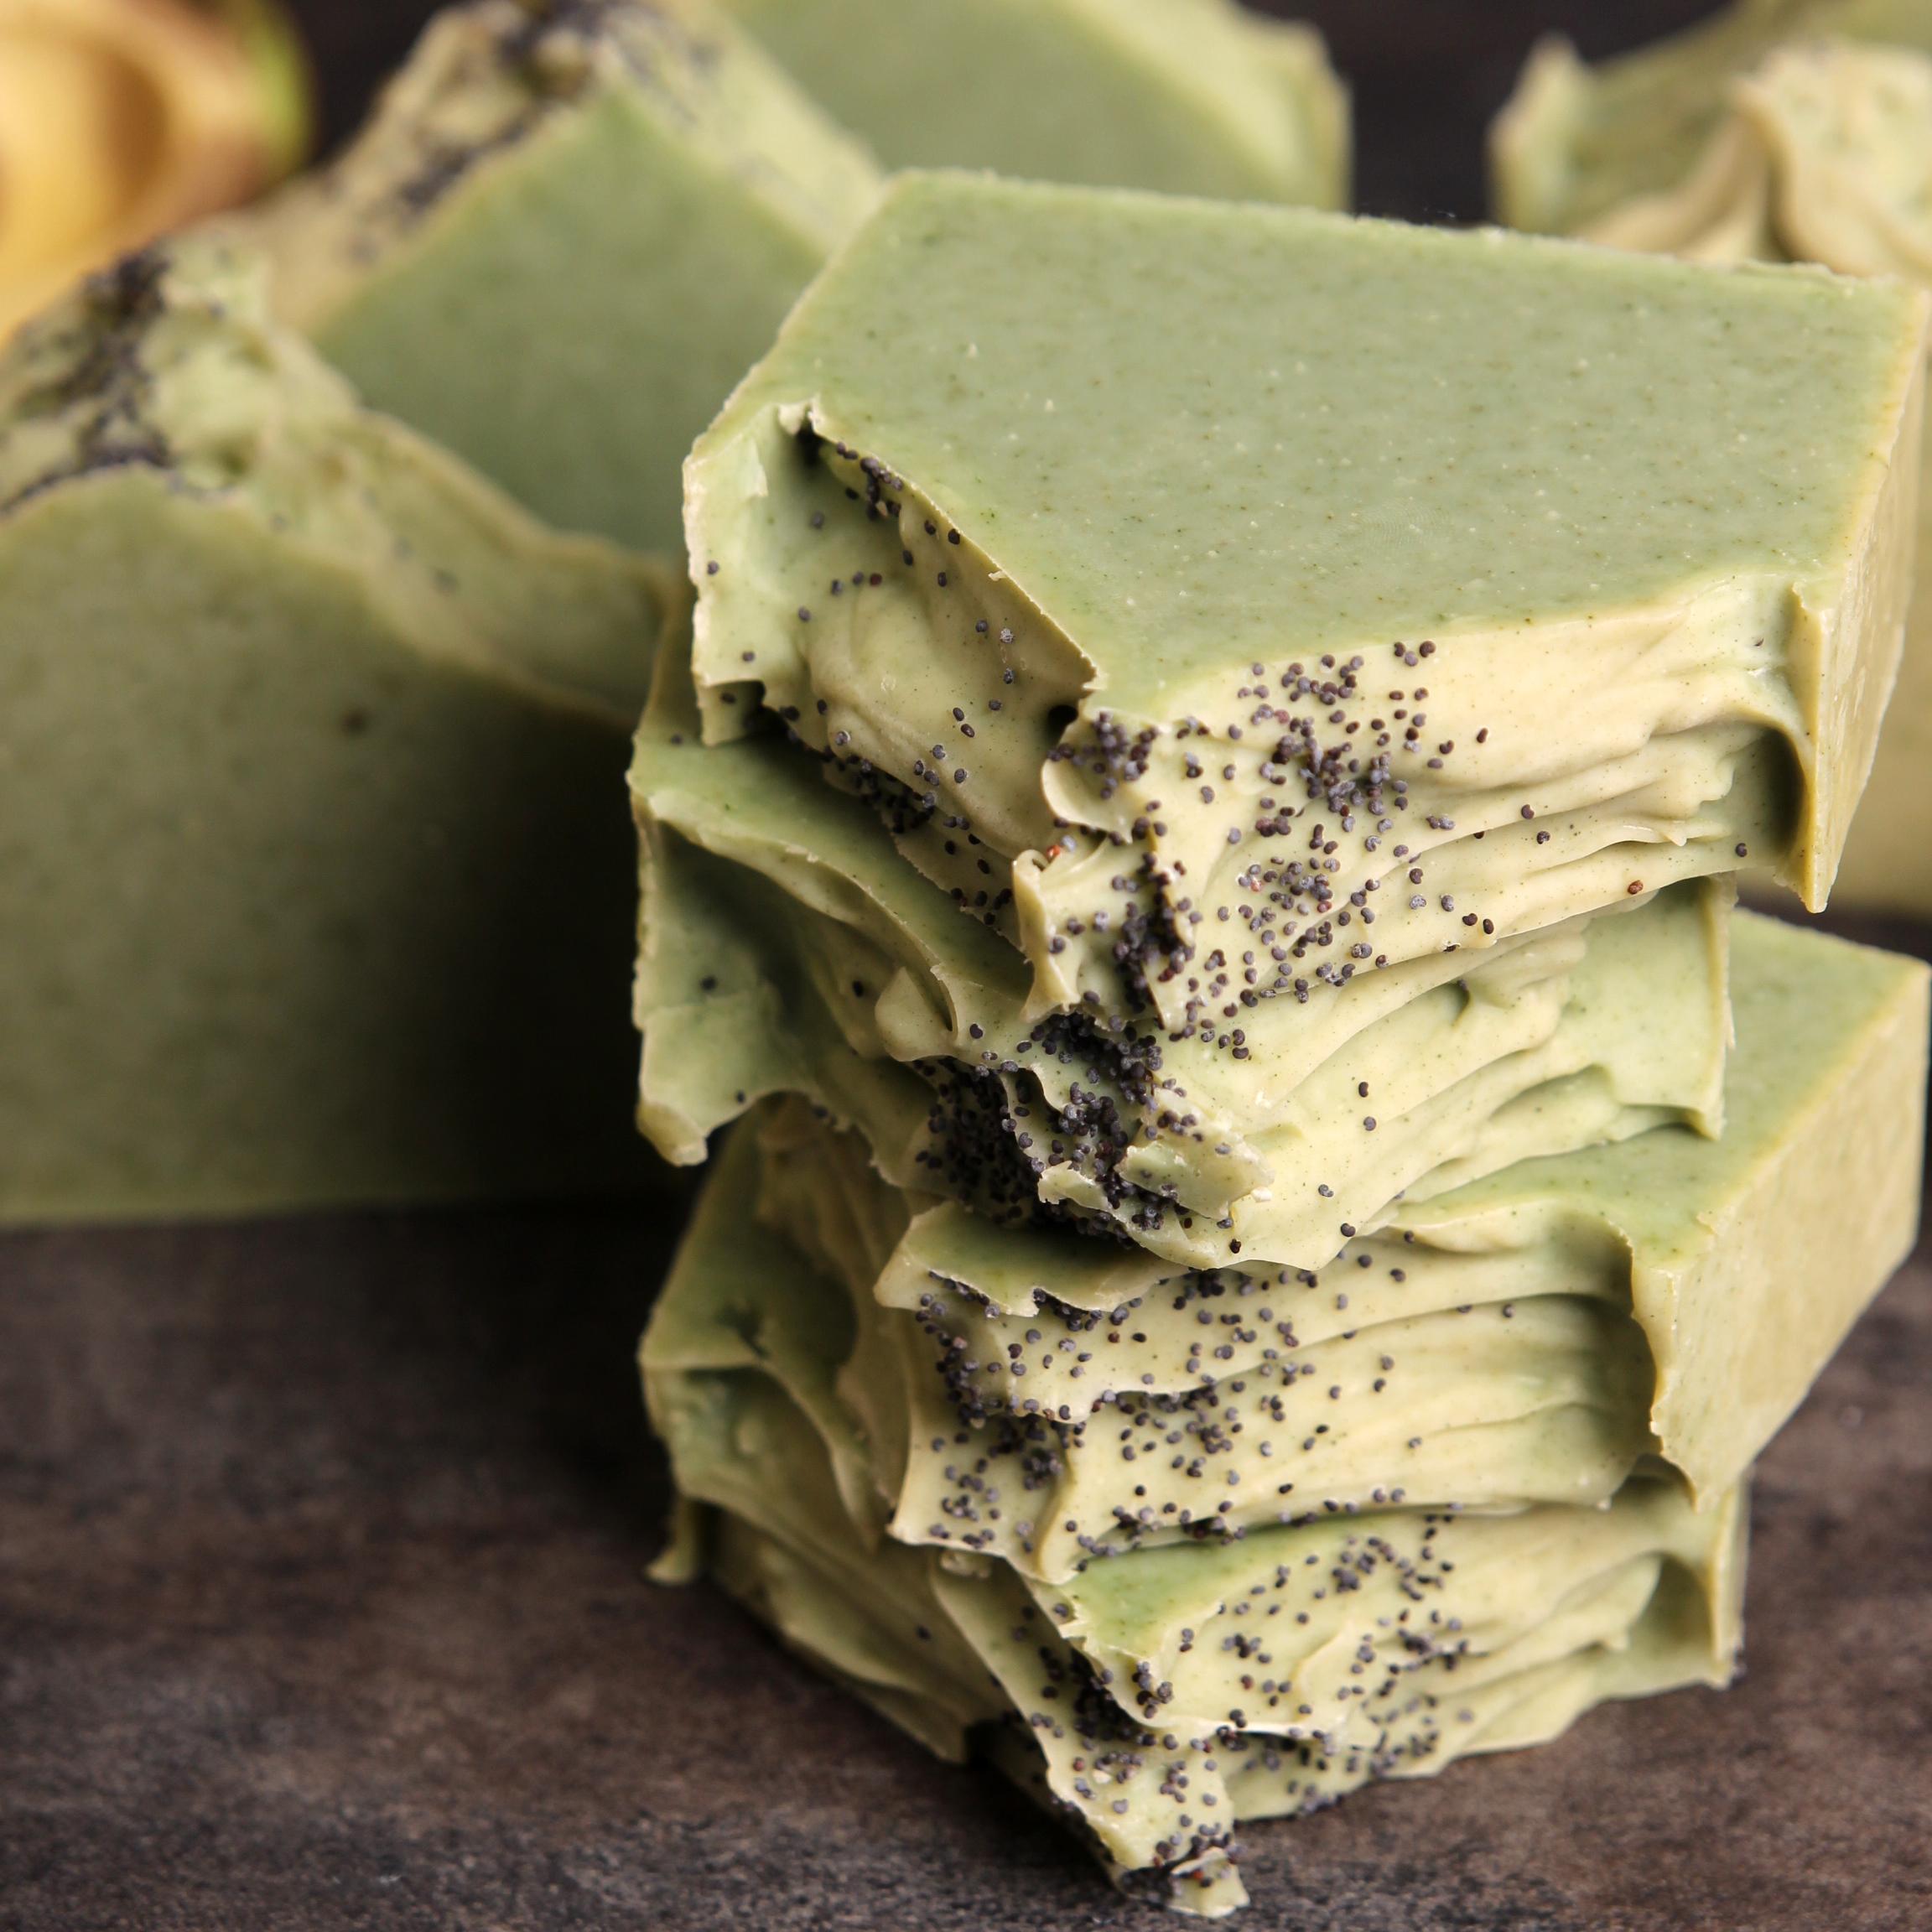 Avocado + Spearmint Cold Process Soap Kit